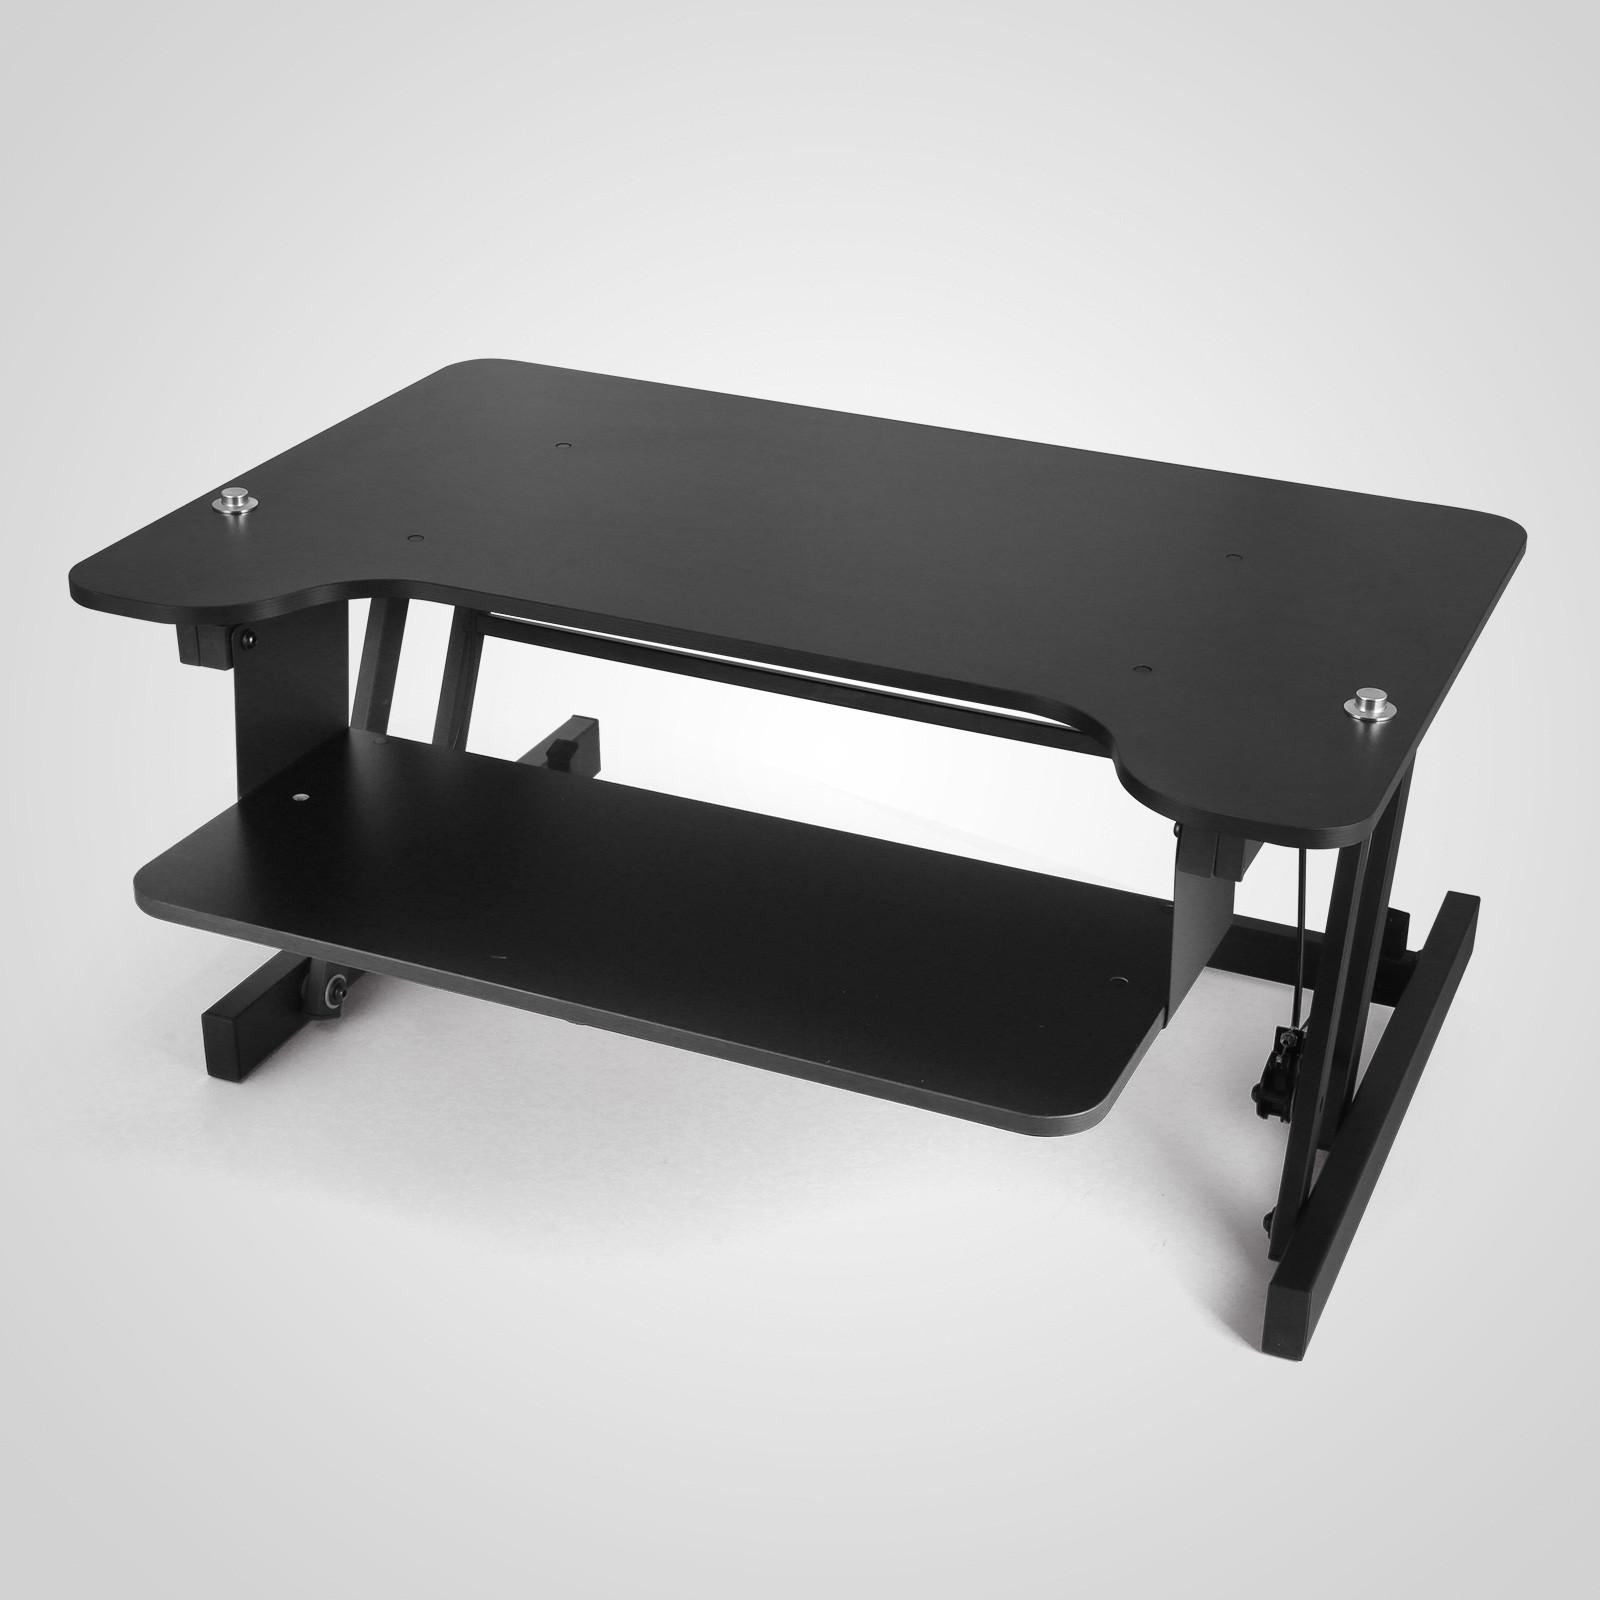 4 Of 12 Ergonomic Adjule Height Stand Up Desk Workstation Riser 31 Wide Newest